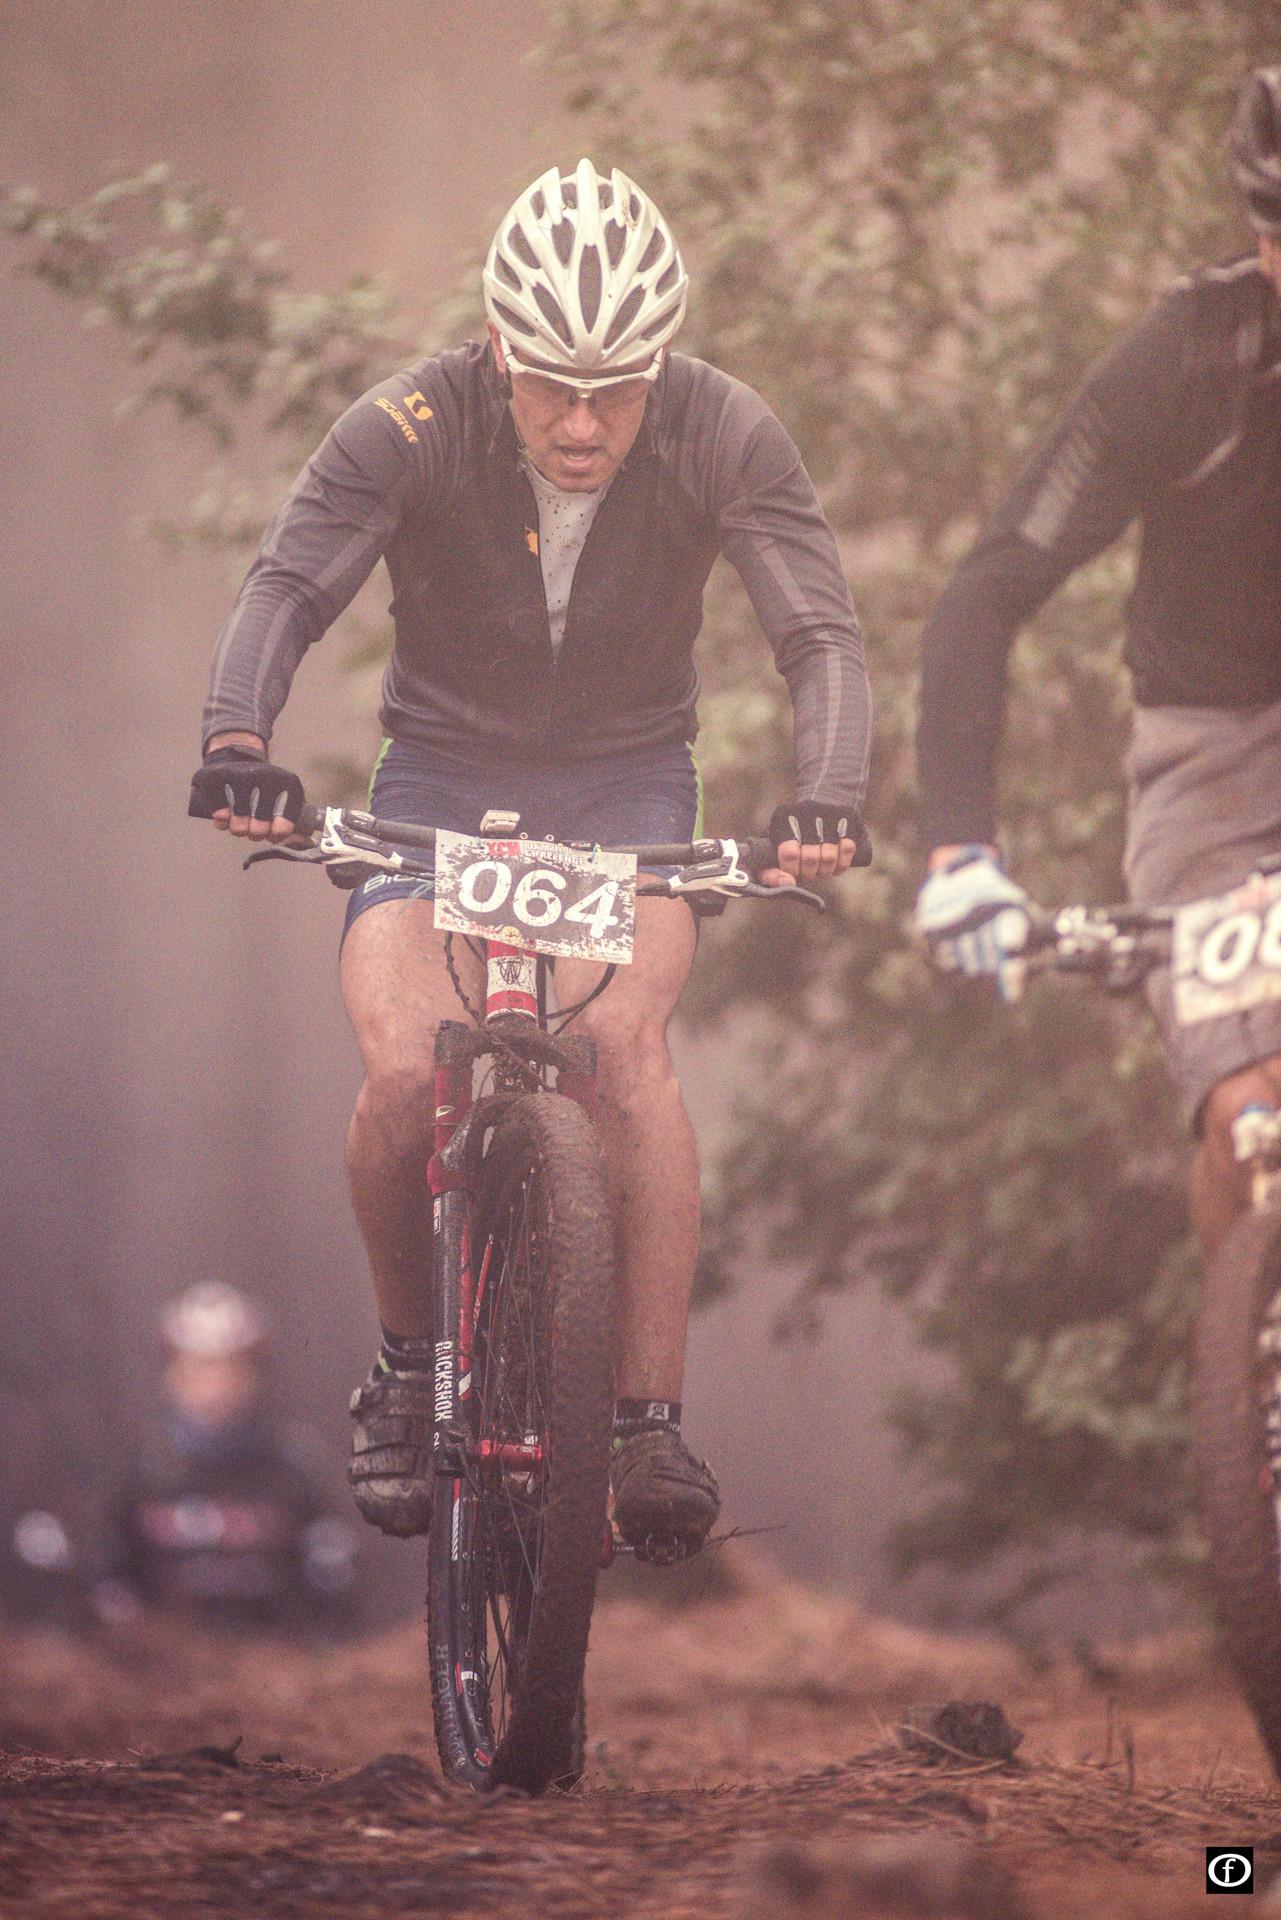 2015-05-17-Ciclismo Enduro-41.jpg